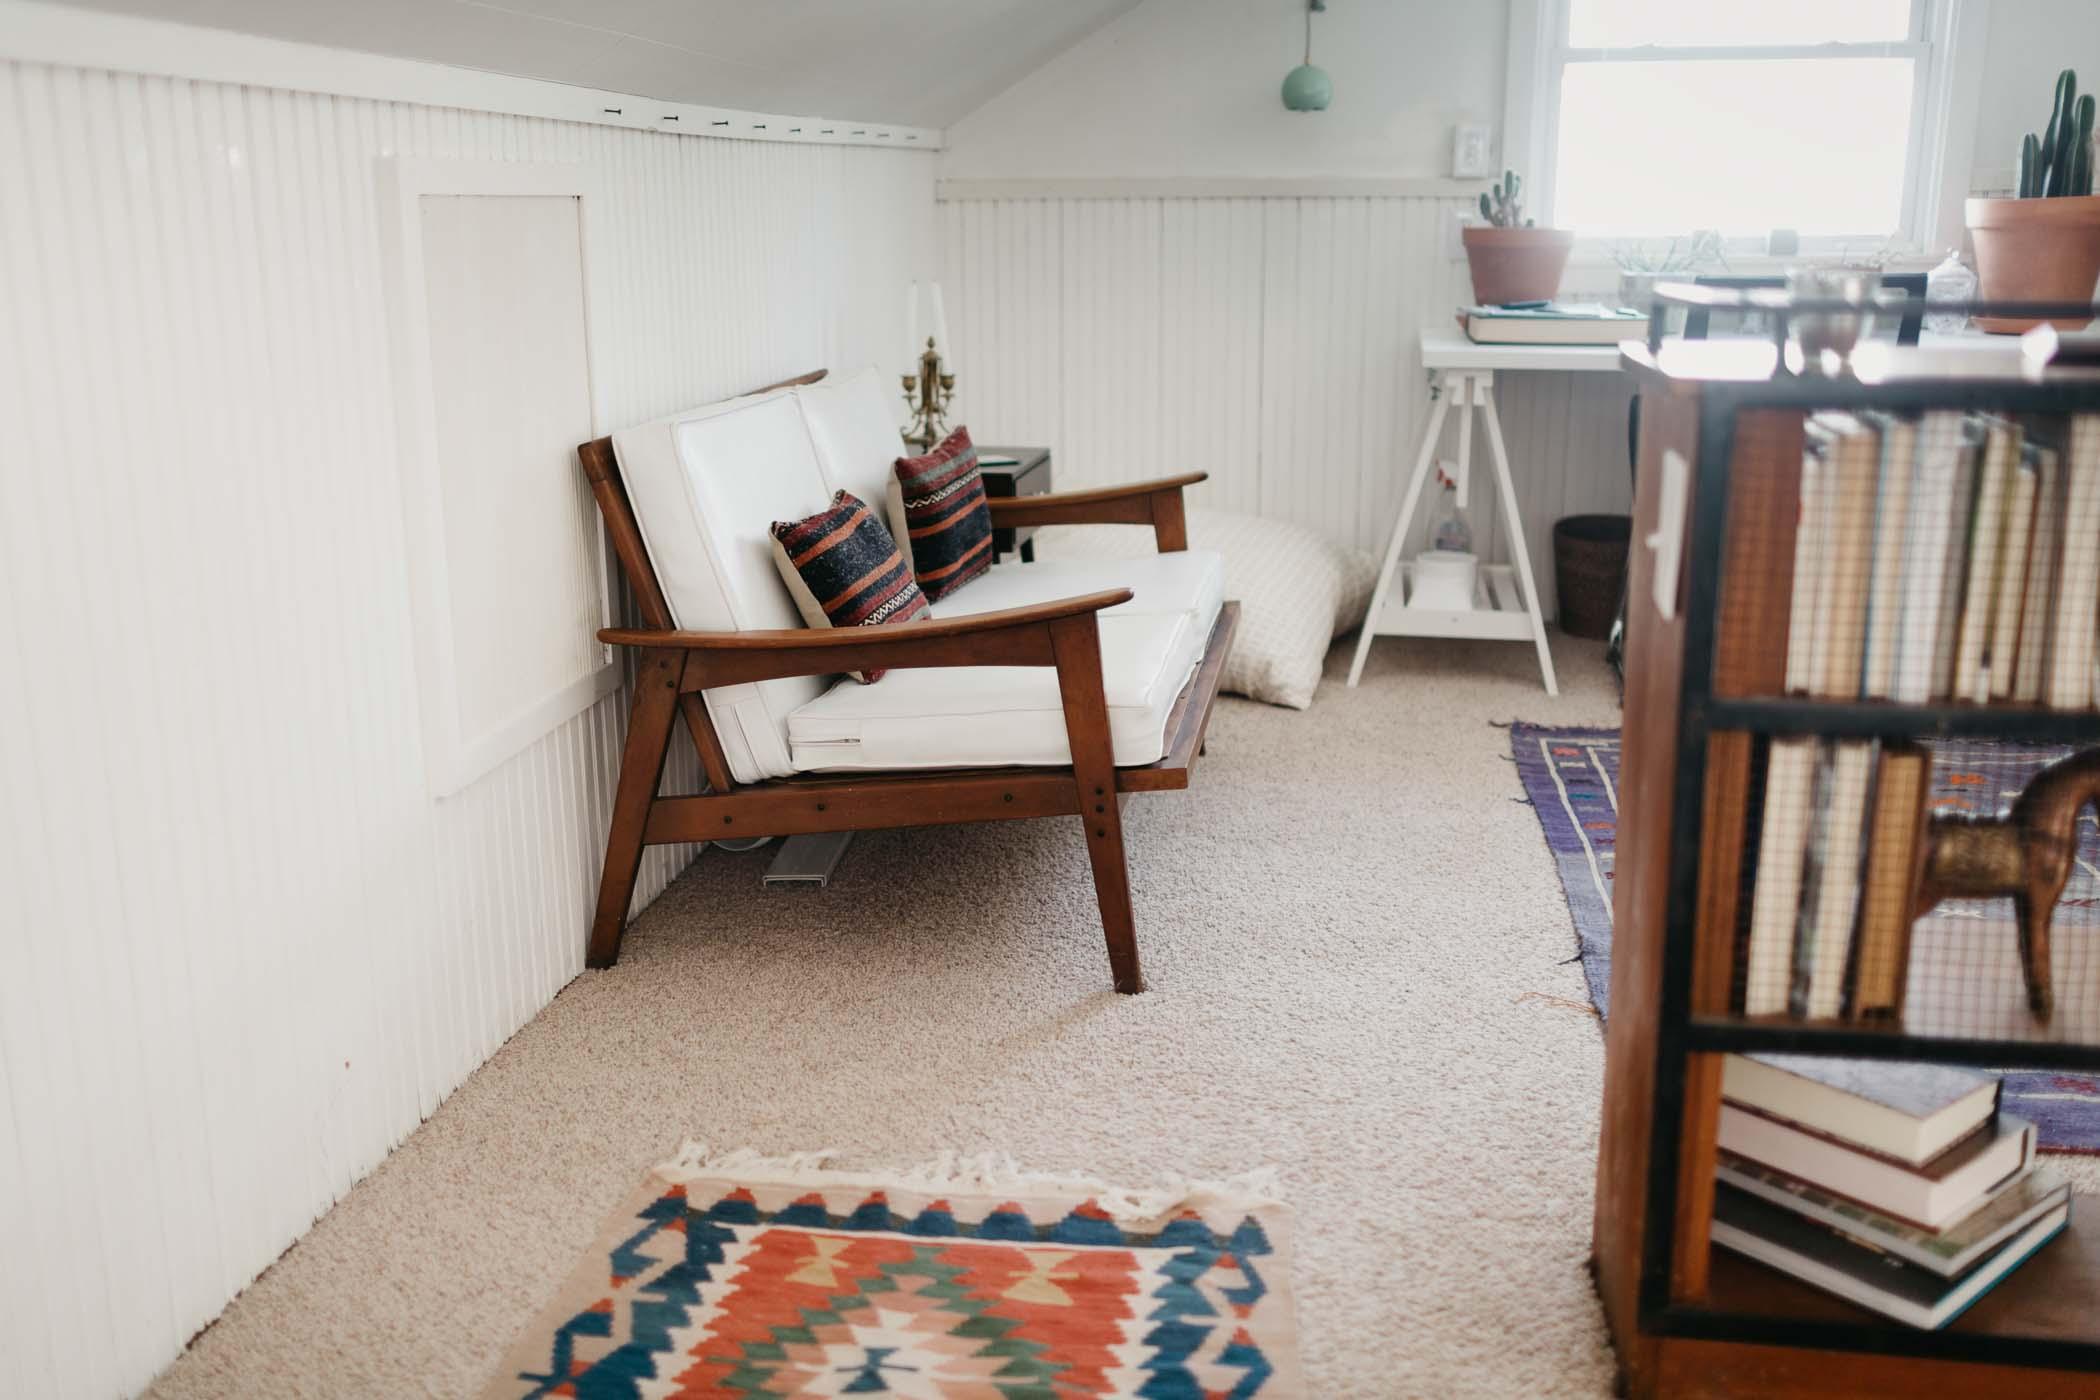 cozy-casa-nashville-tn-natural-light-studio-photography-ideas-lifestyle-photographer-photography-42.jpg